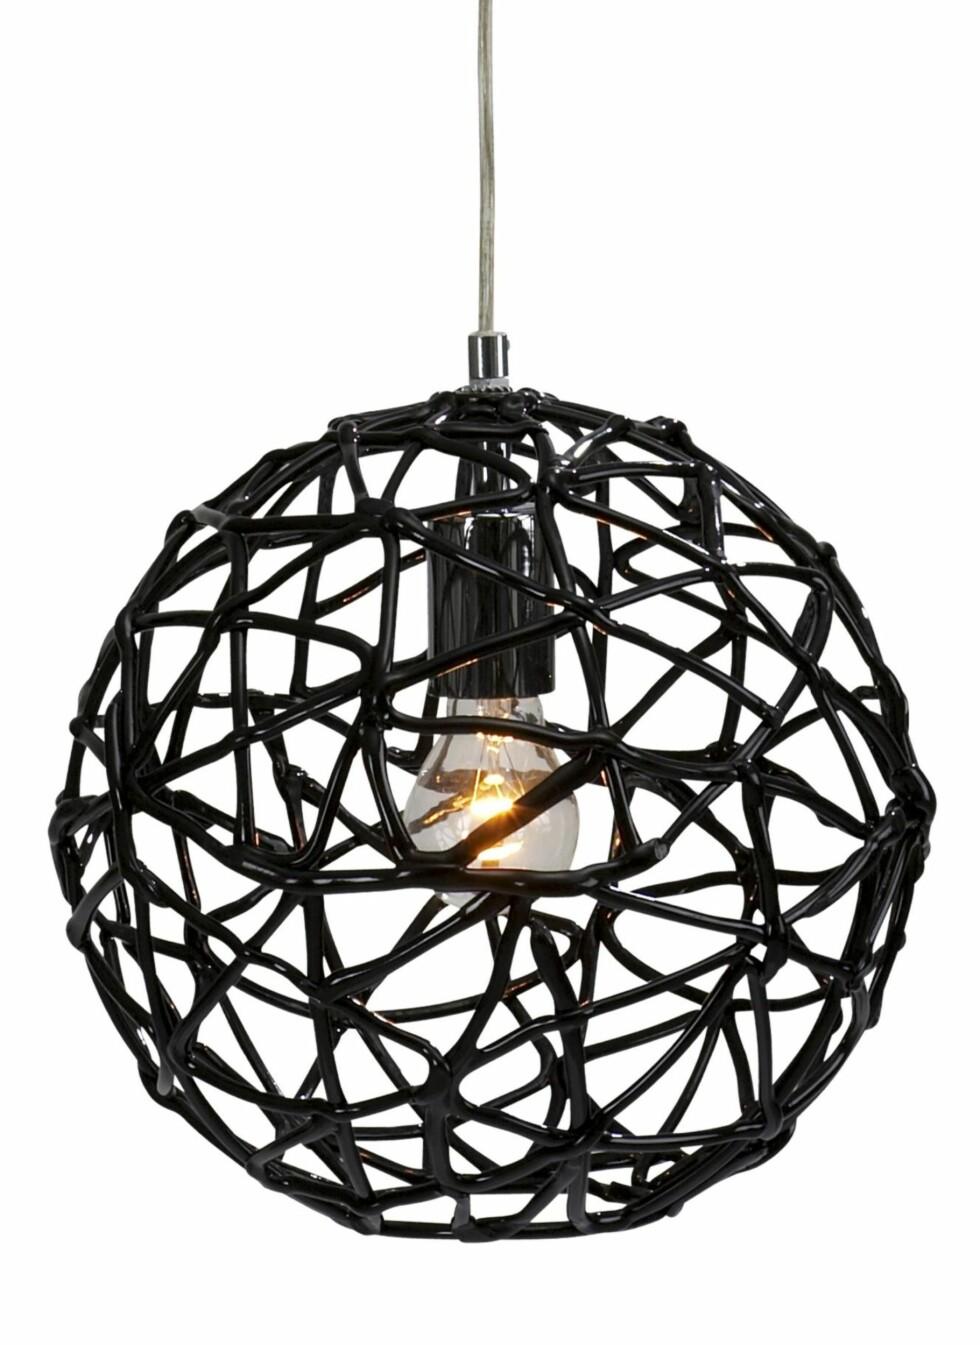 Lampa i glansfull akryl, Jotex, kr 399. Foto: Produsenten